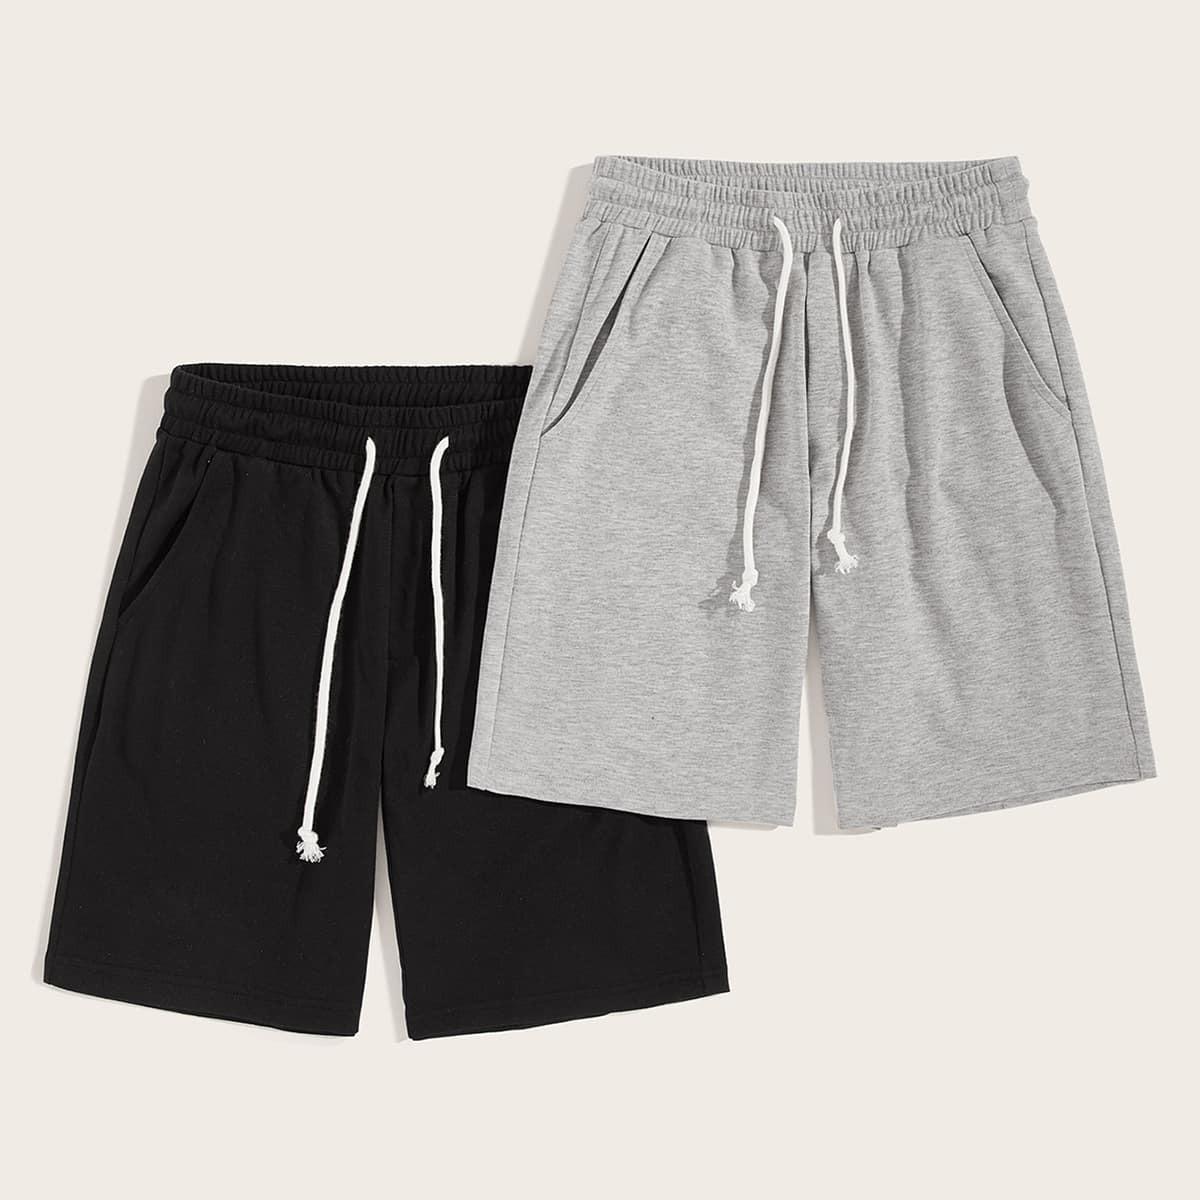 SHEIN coupon: Men Heather Knit Slant Pocket Drawstring Athletic Shorts 2PCS